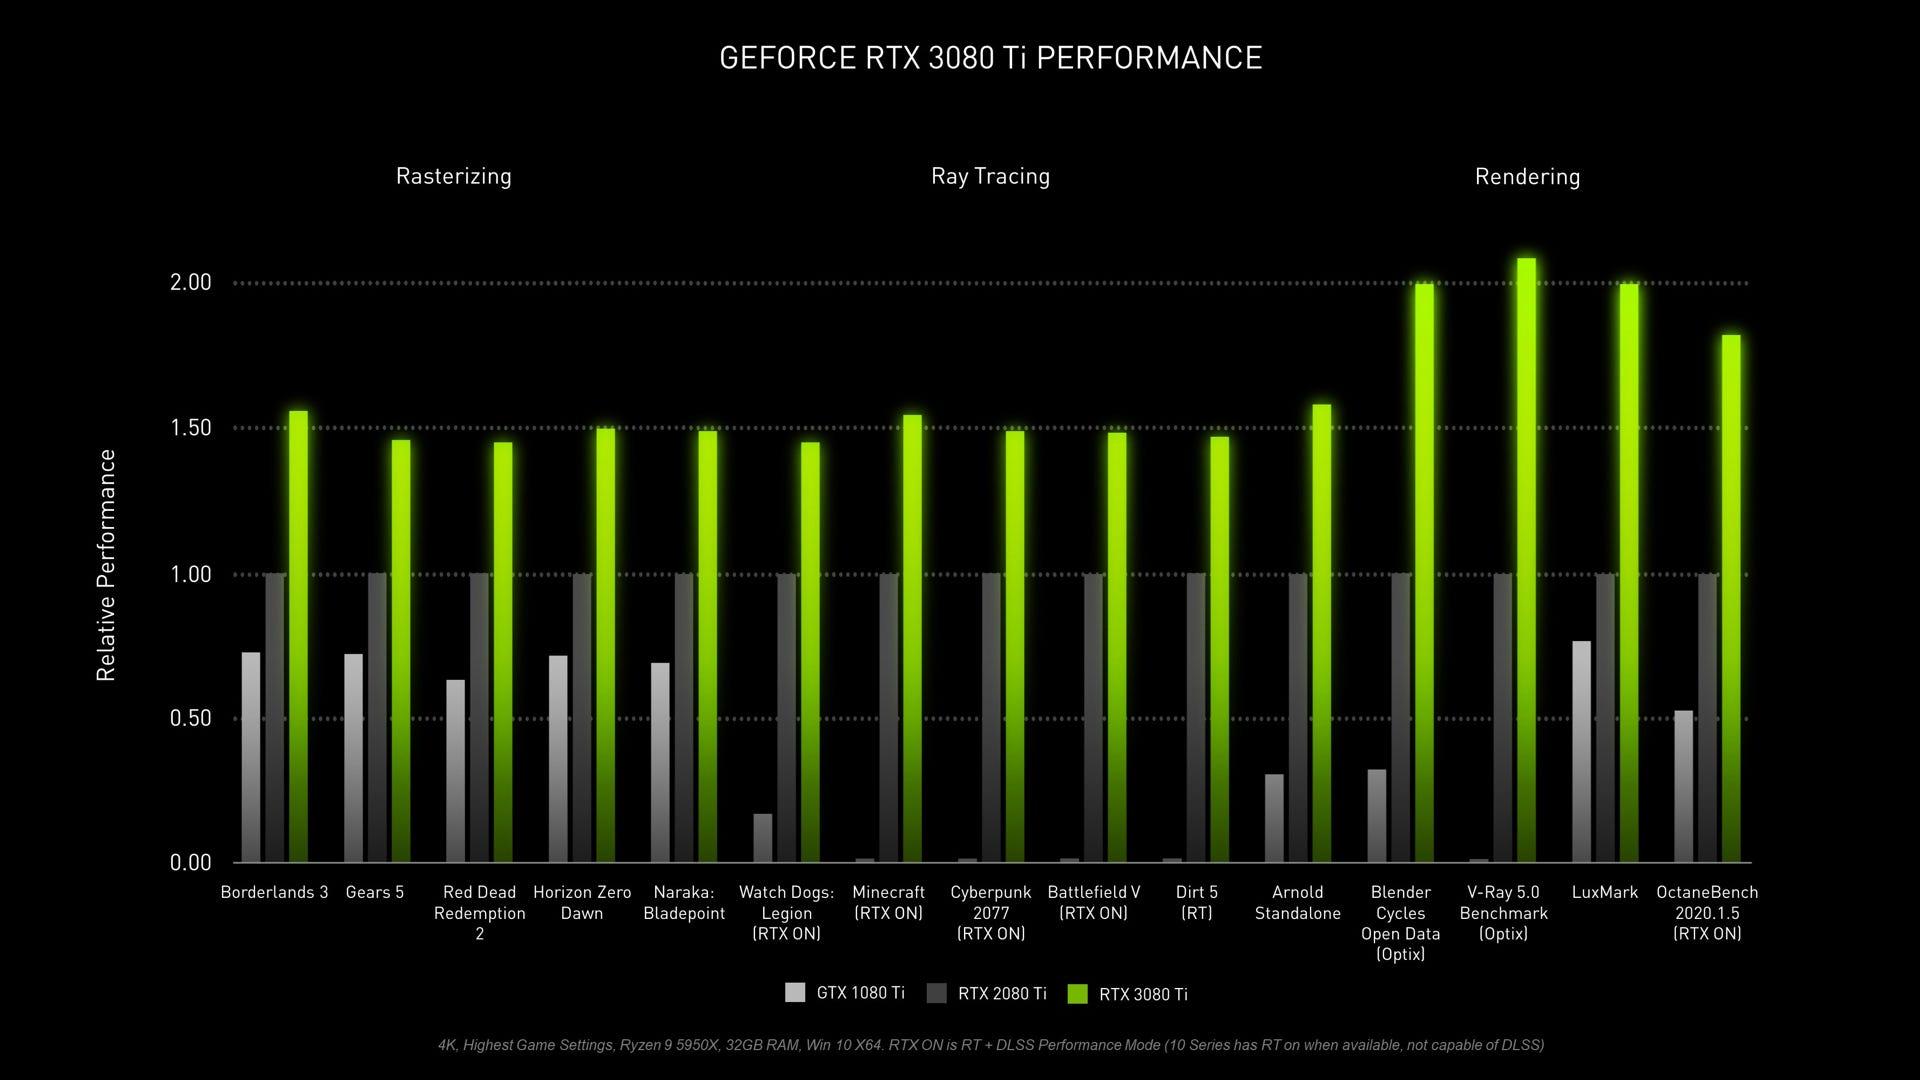 GeForce RTX 3080 Ti performance graph